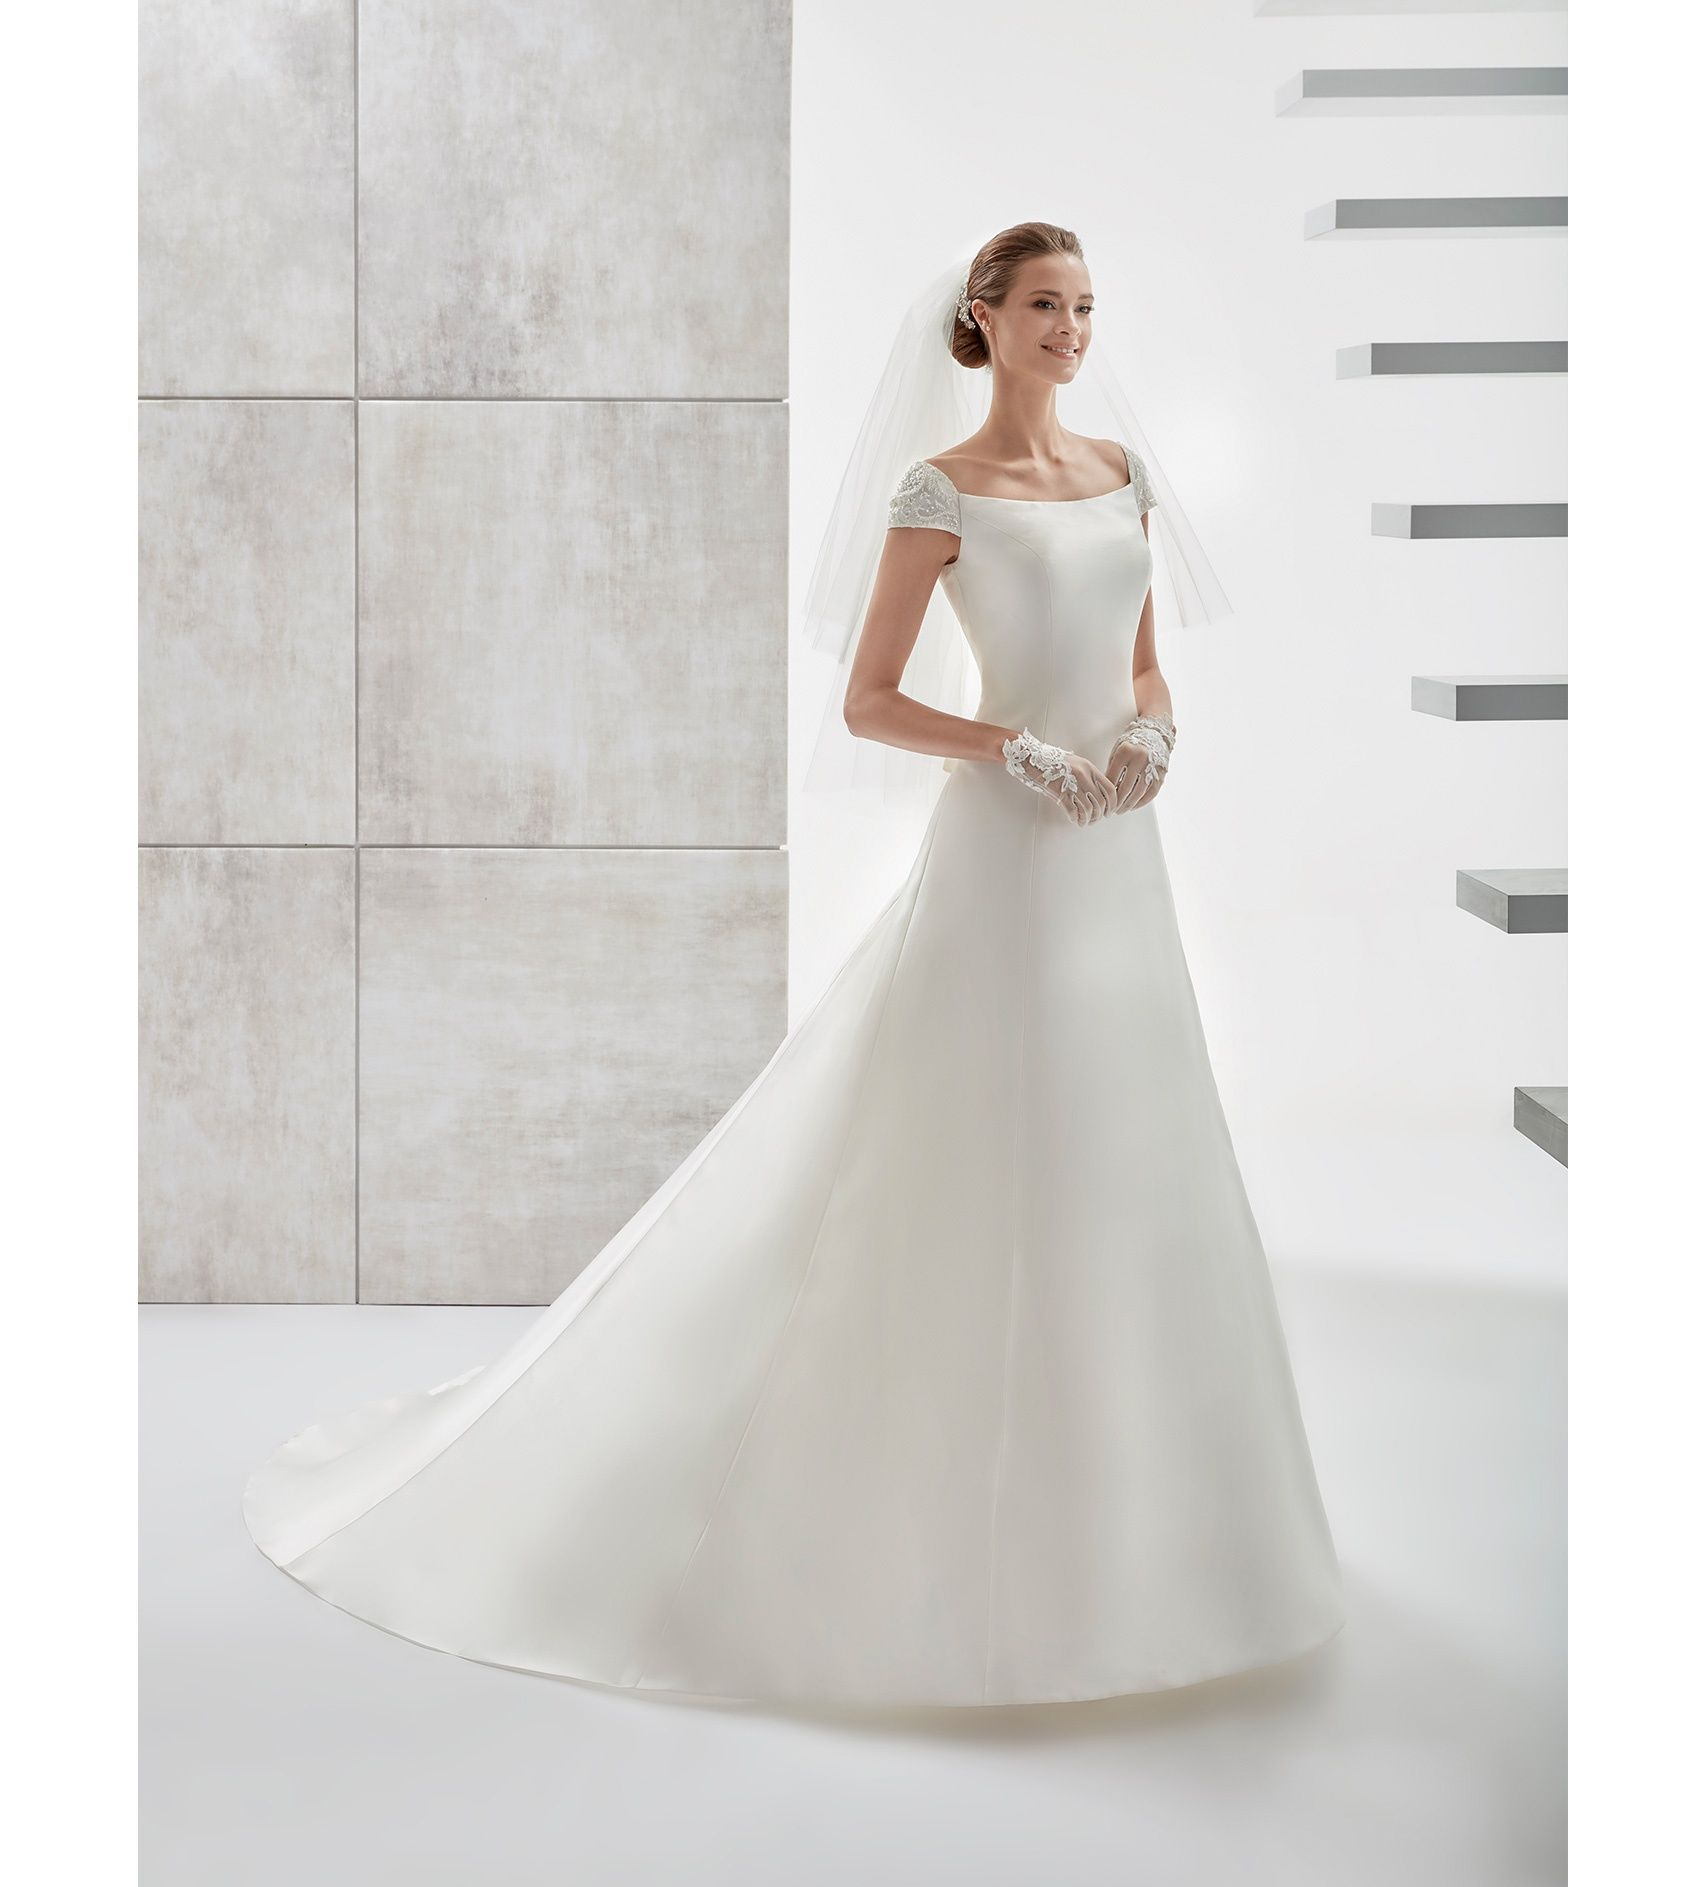 Abito Da Sposa Nicole Collezione Aurora Auab17971 2017 Online Wedding Dress Gorgeous Wedding Dress A Line Wedding Dress